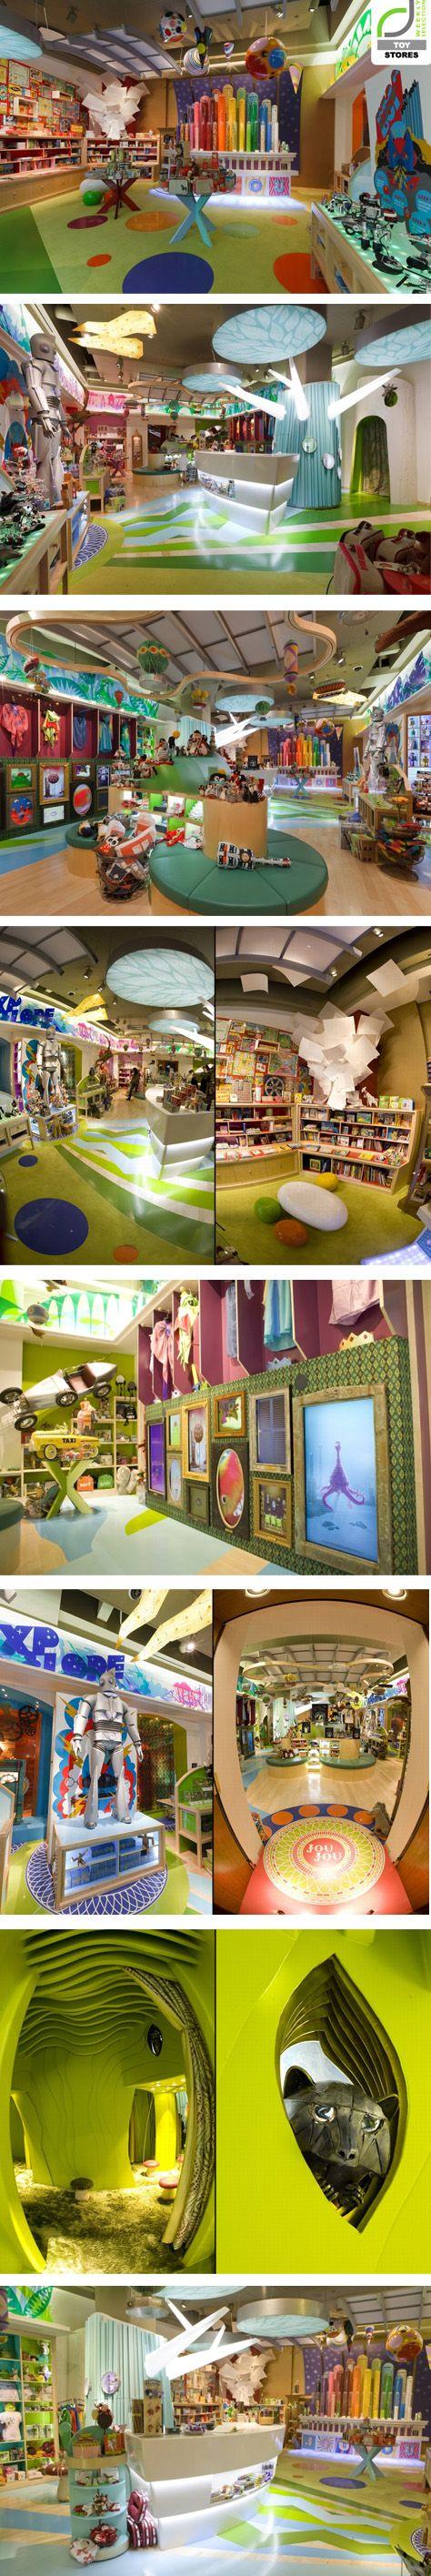 Salt lake city interior designers - Jou Jou Toy Store By Watts Architects Salt Lake City Utah